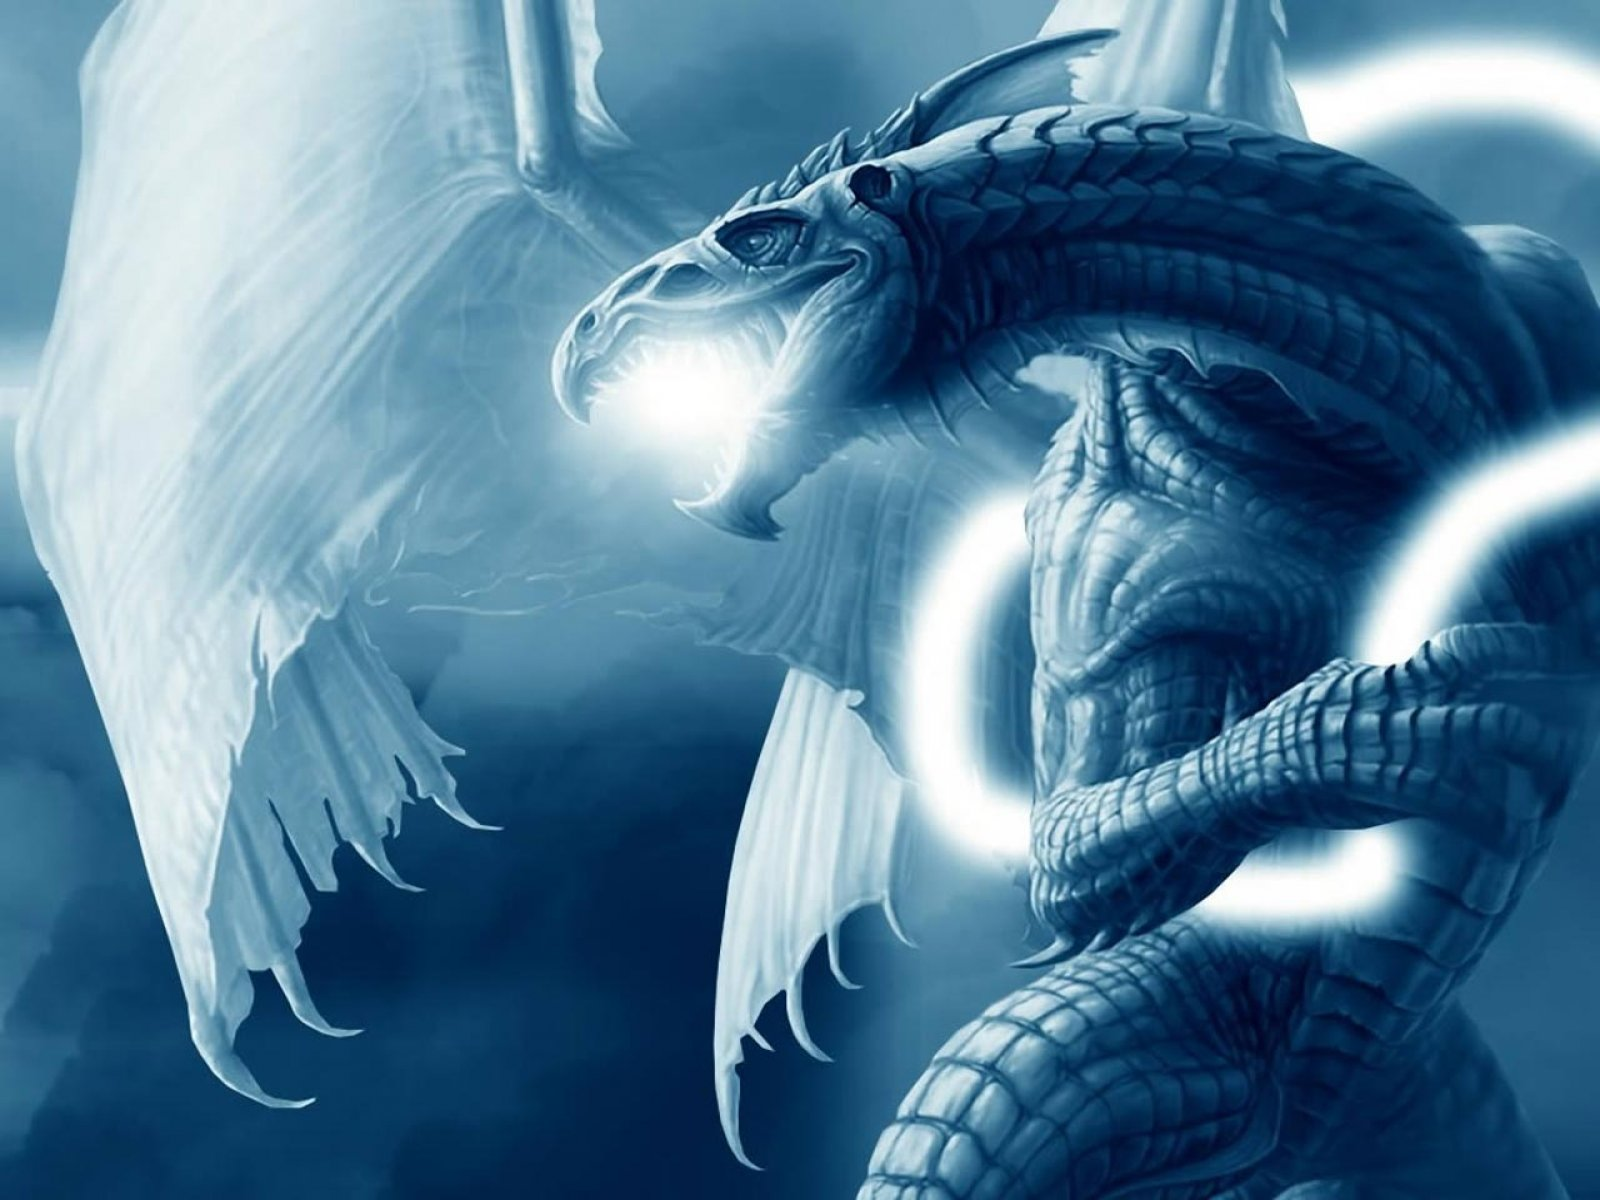 1600x1200px free dragon screensavers and wallpaper wallpapersafari